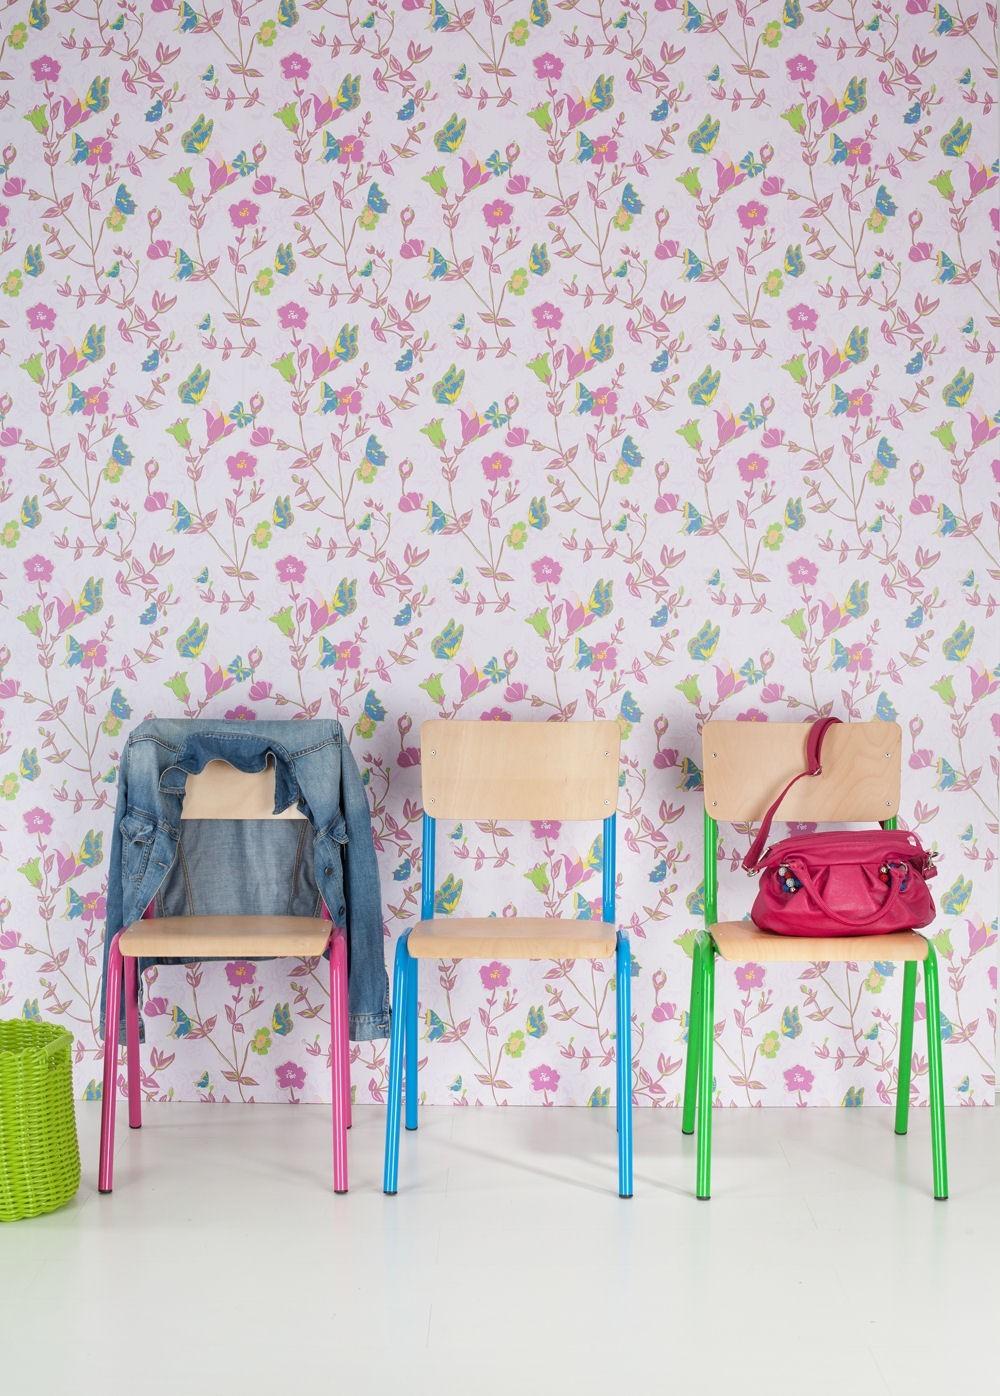 Barbara Becker Tapete Schmetterling : Tapete Rasch Vintage Chic Vliestapete 321585 Schmetterling rosa pink